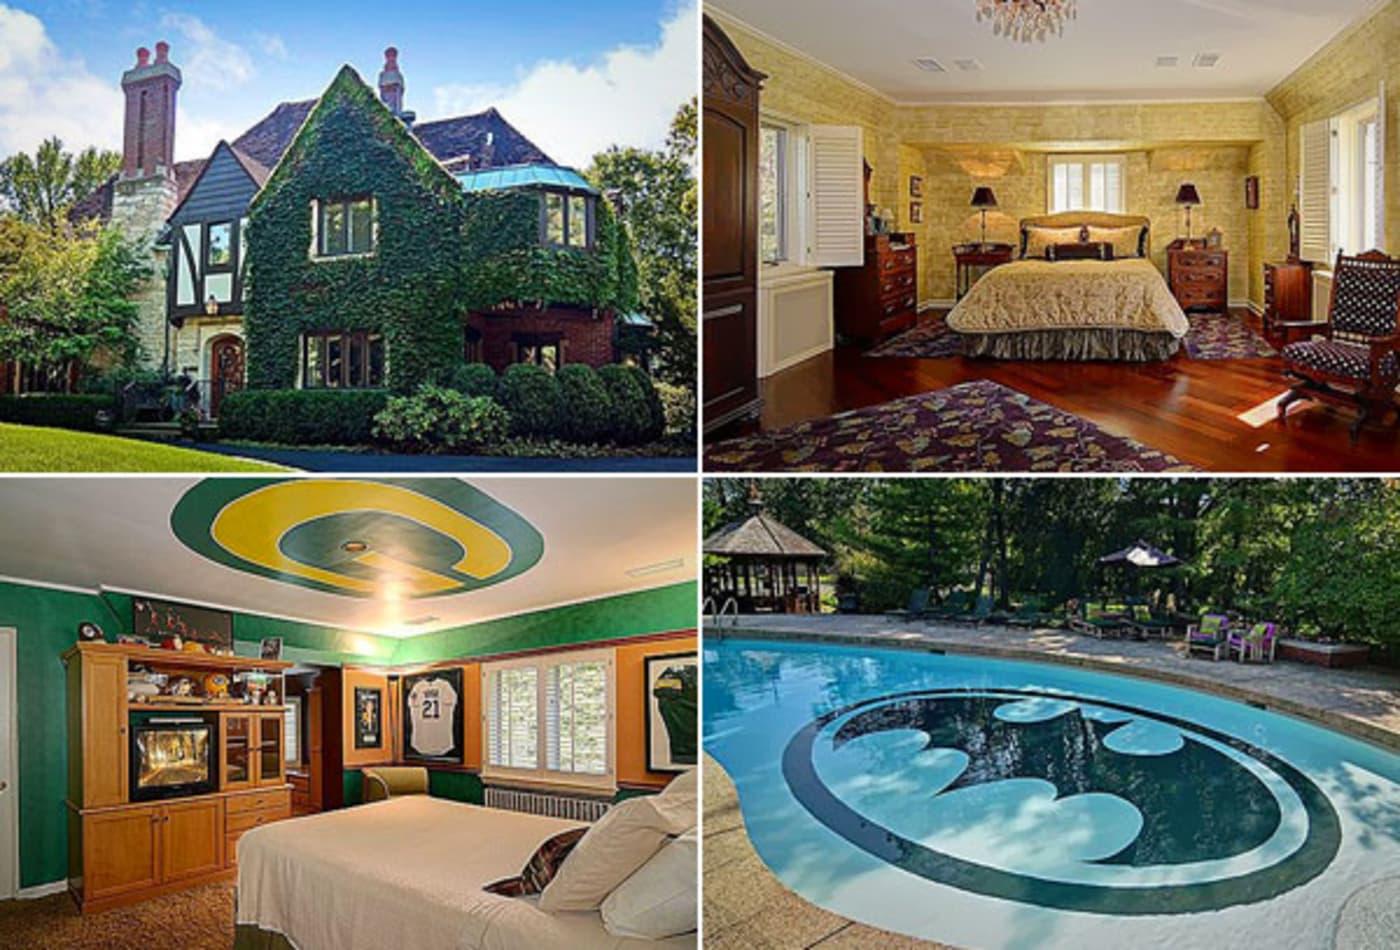 Batman-Pool-Hinsdale-Illinois-Obsession-Homes-CNBC.jpg